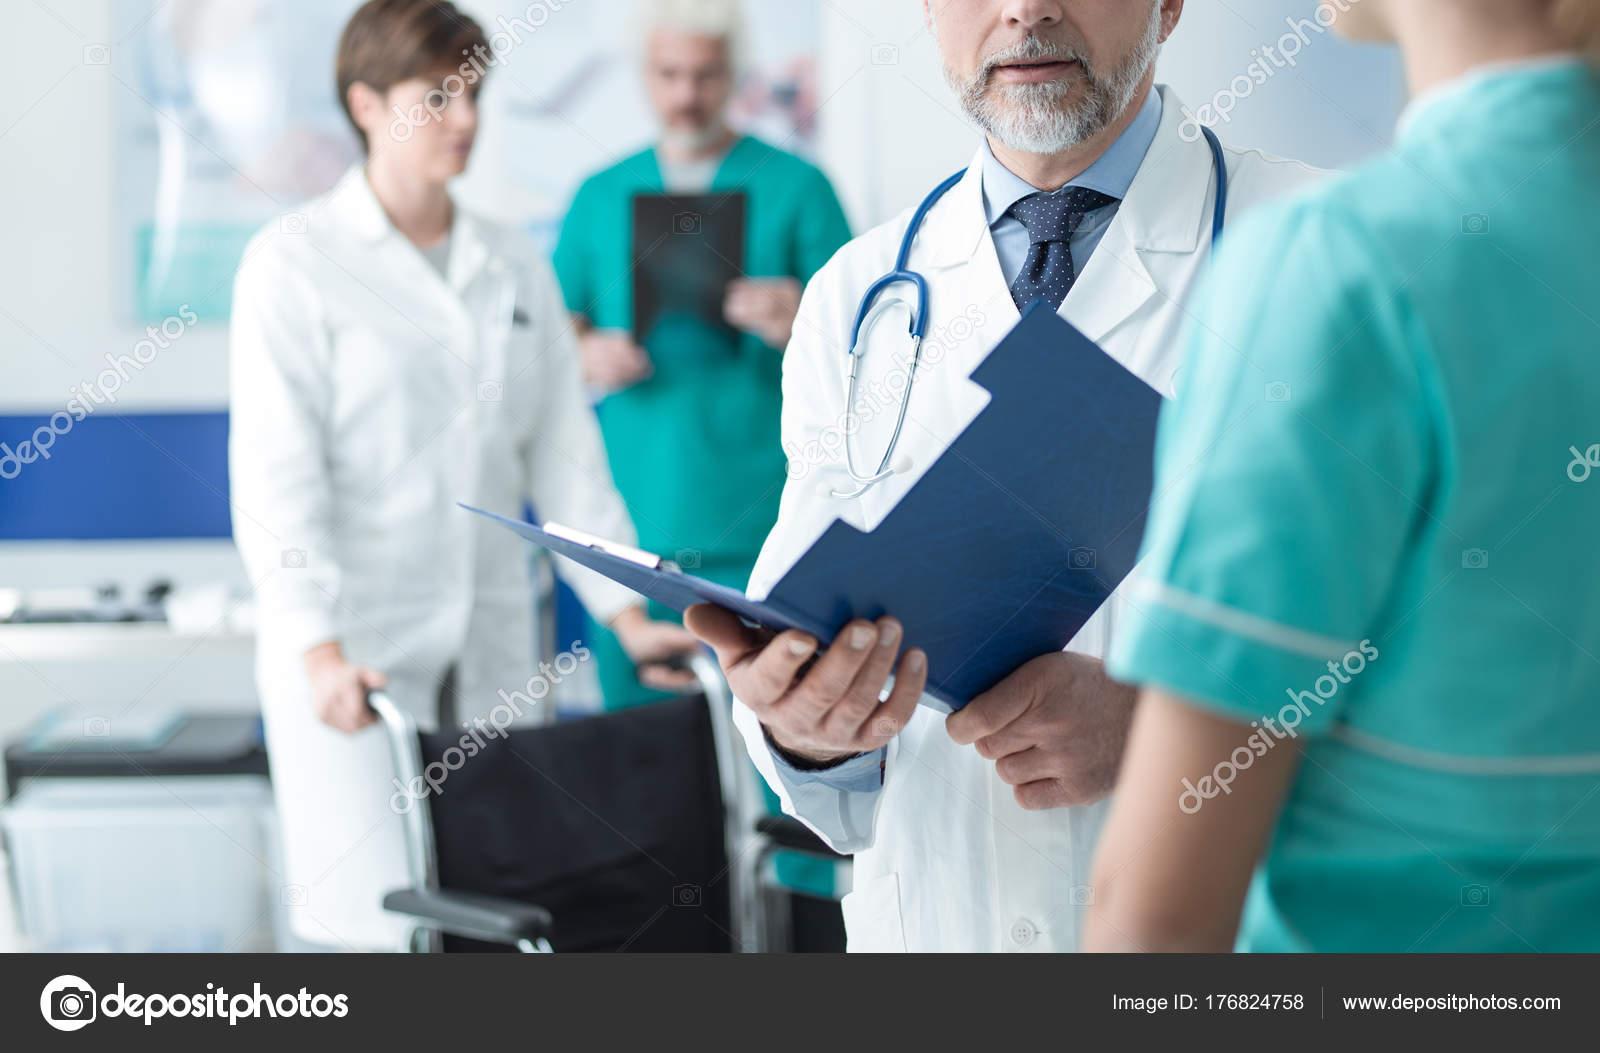 Medecin Professionnel Personnel Medical Travaillant Hopital Examine